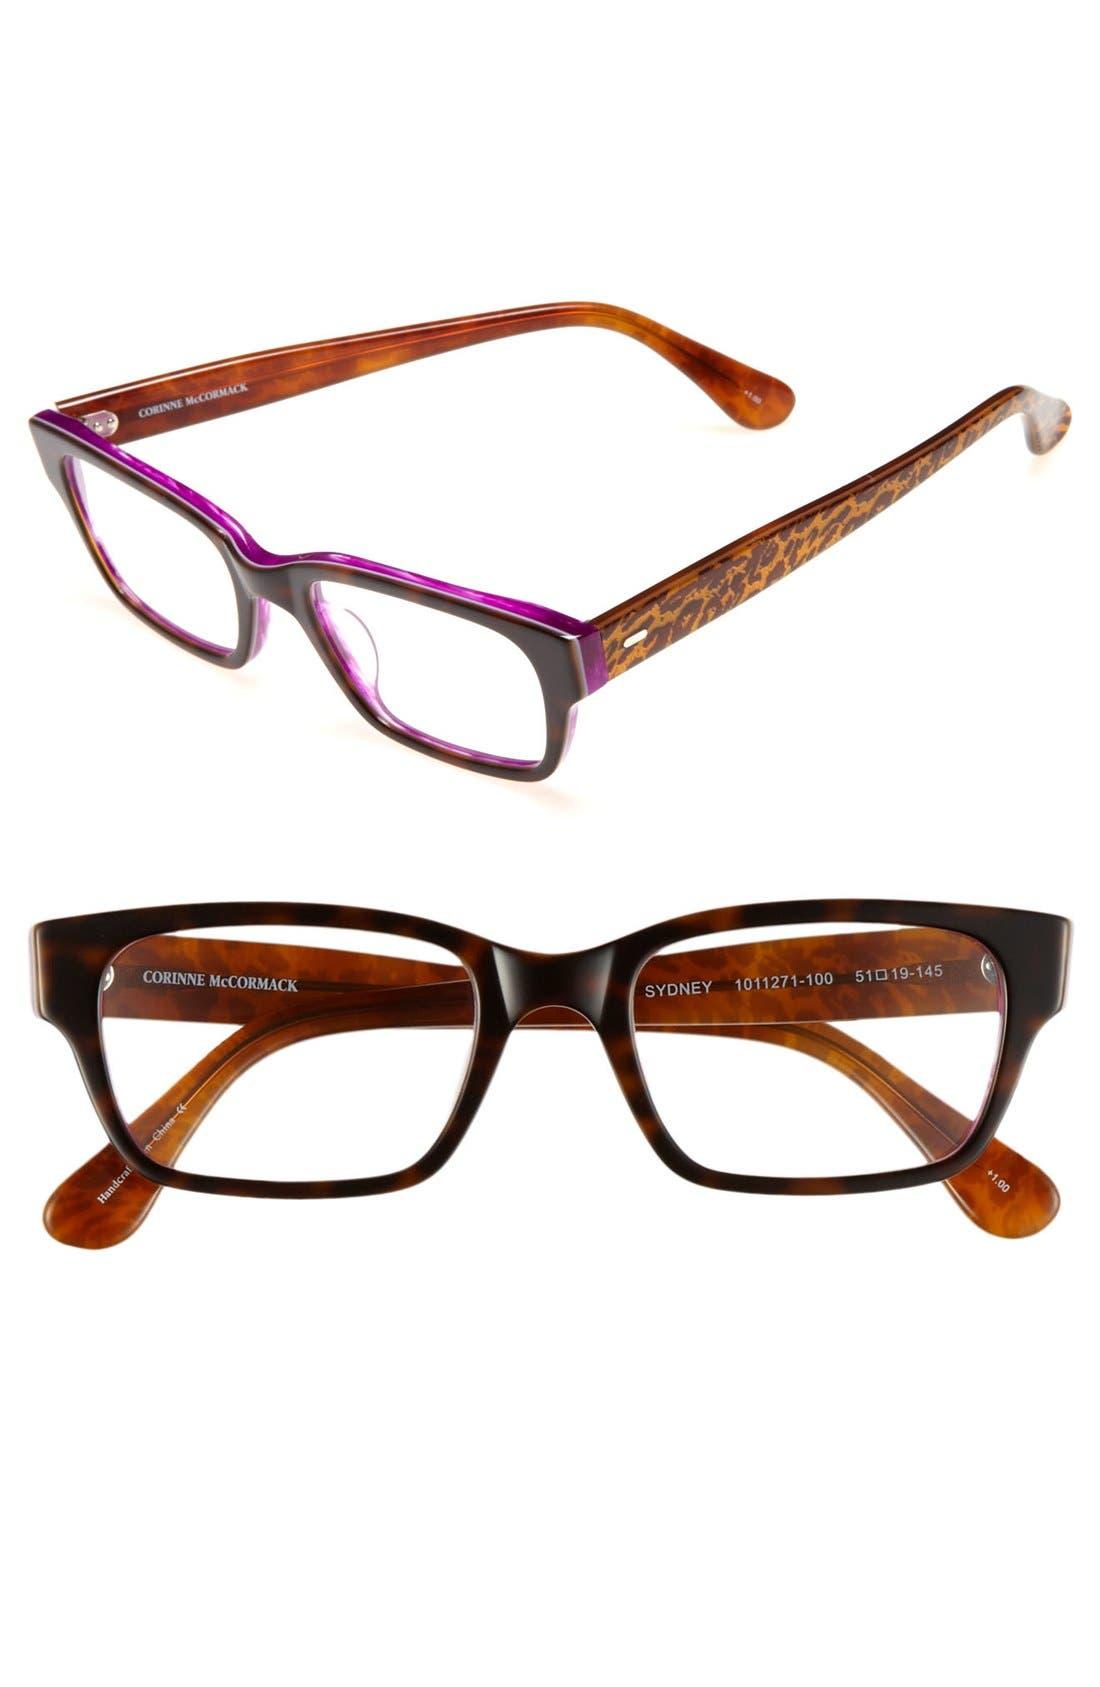 Alternate Image 1 Selected - Corinne McCormack 'Sydney' 51mm Reading Glasses